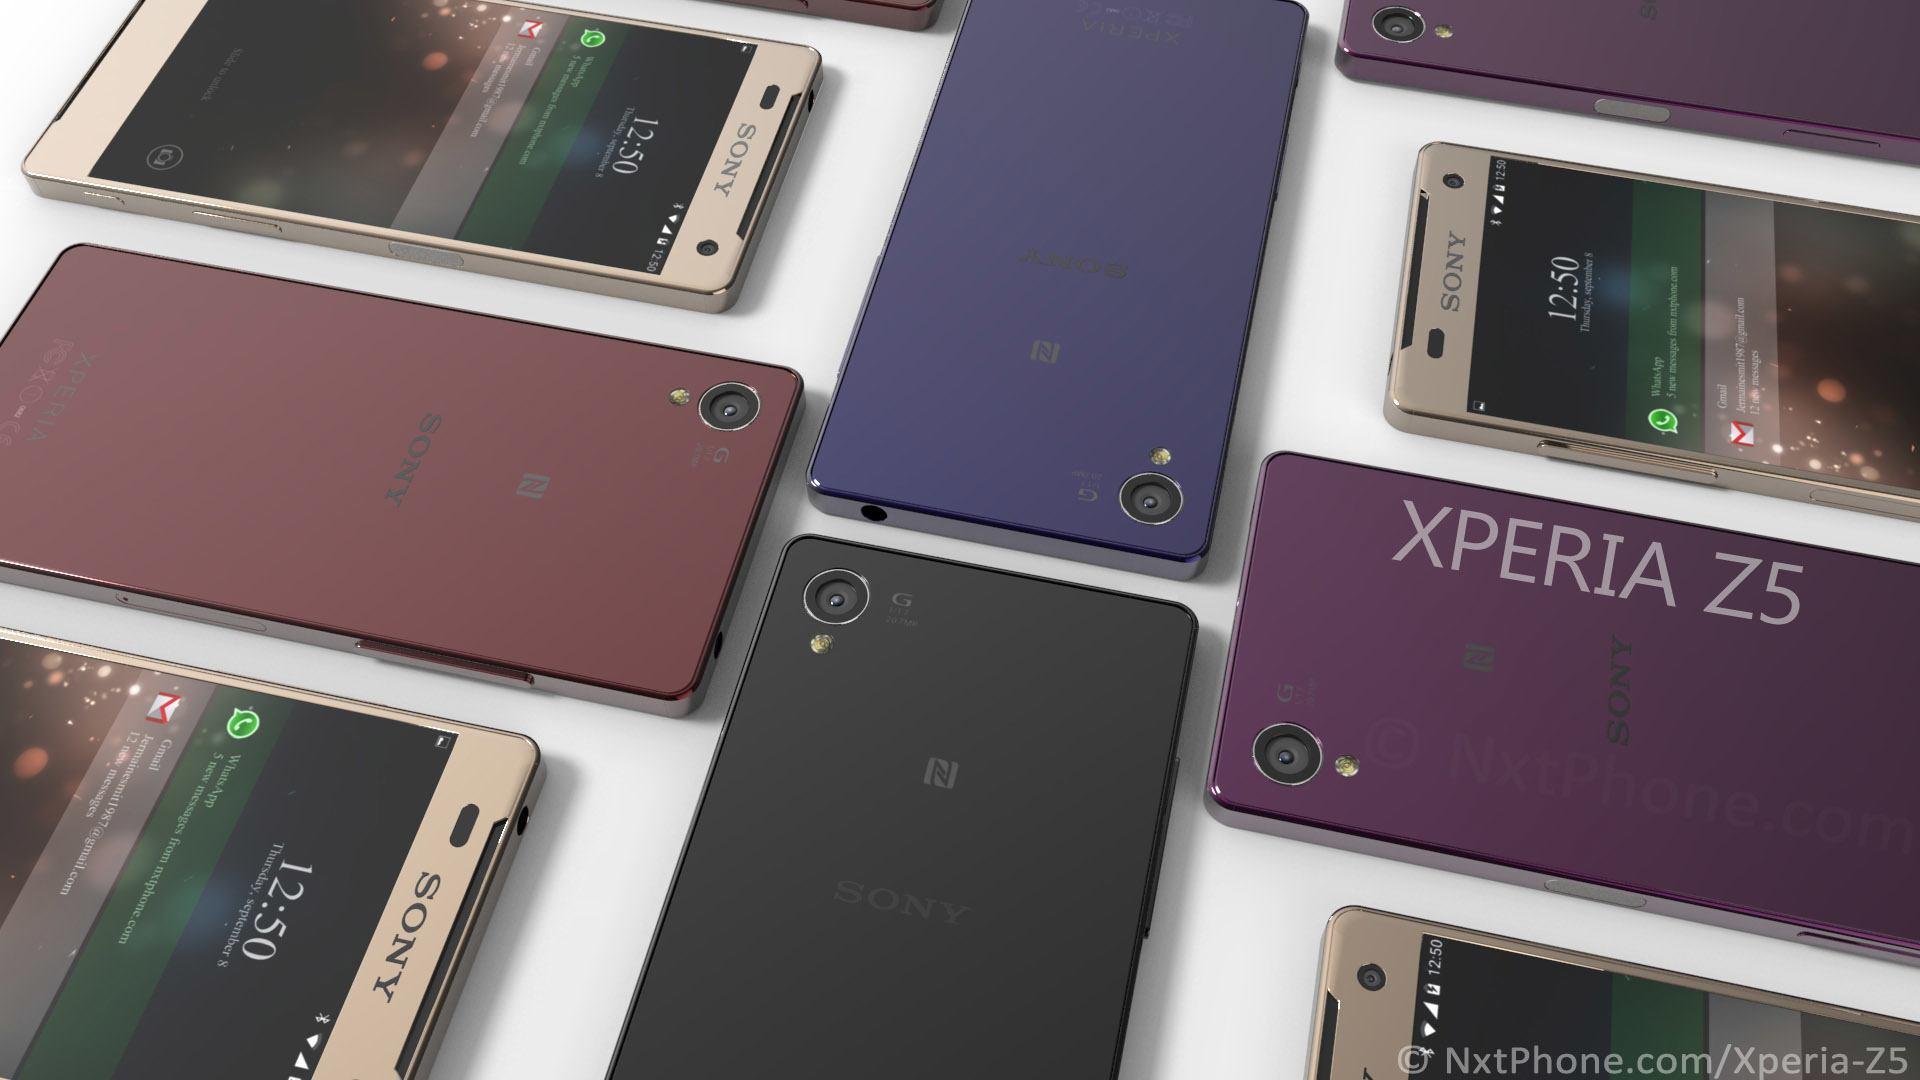 Xperia-Z5-NxtPhone.com-2